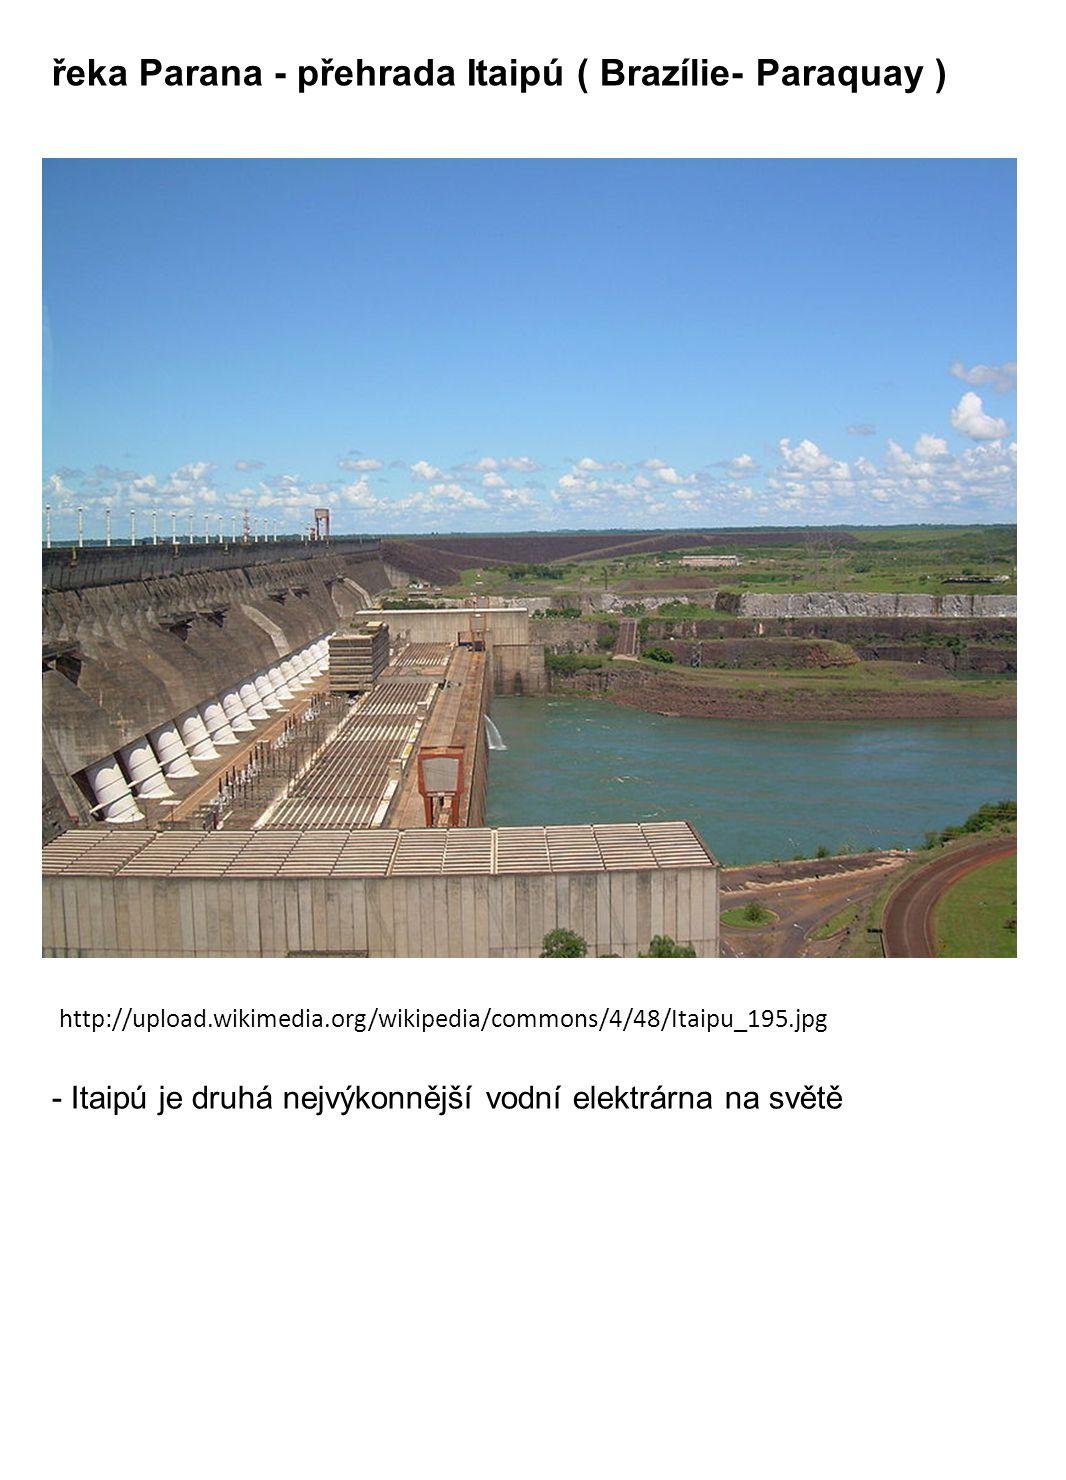 řeka Parana - přehrada Itaipú ( Brazílie- Paraquay ) http://upload.wikimedia.org/wikipedia/commons/4/48/Itaipu_195.jpg - Itaipú je druhá nejvýkonnější